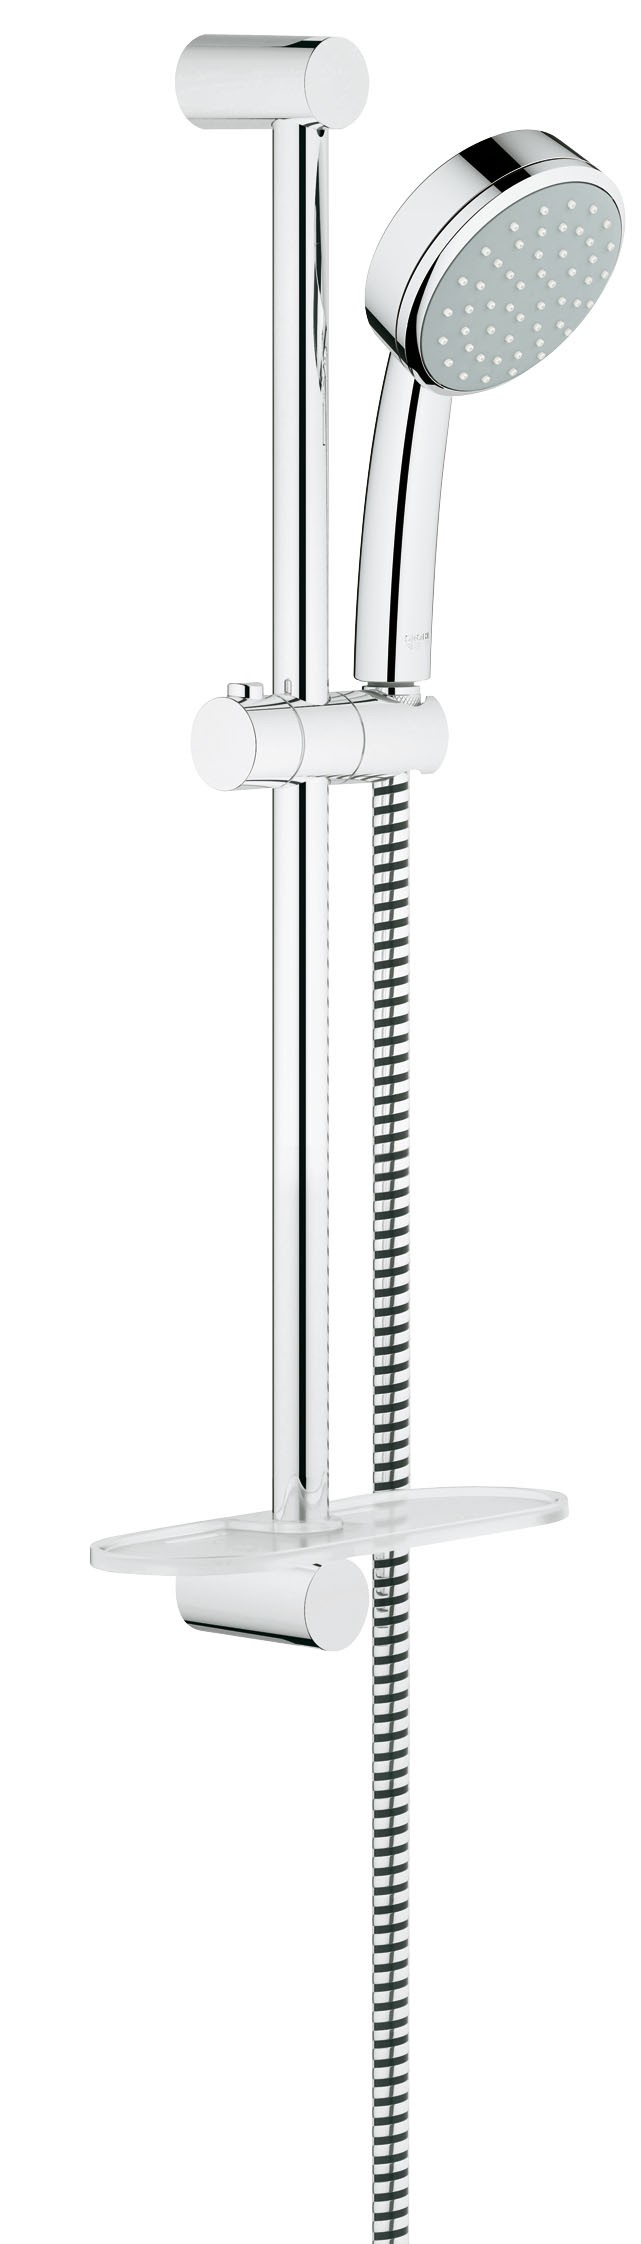 Душевой гарнитур Grohe 26083001 Tempesta Cosmopolitan (ручной душ, штанга 600 мм, шланг 1750 мм), хром